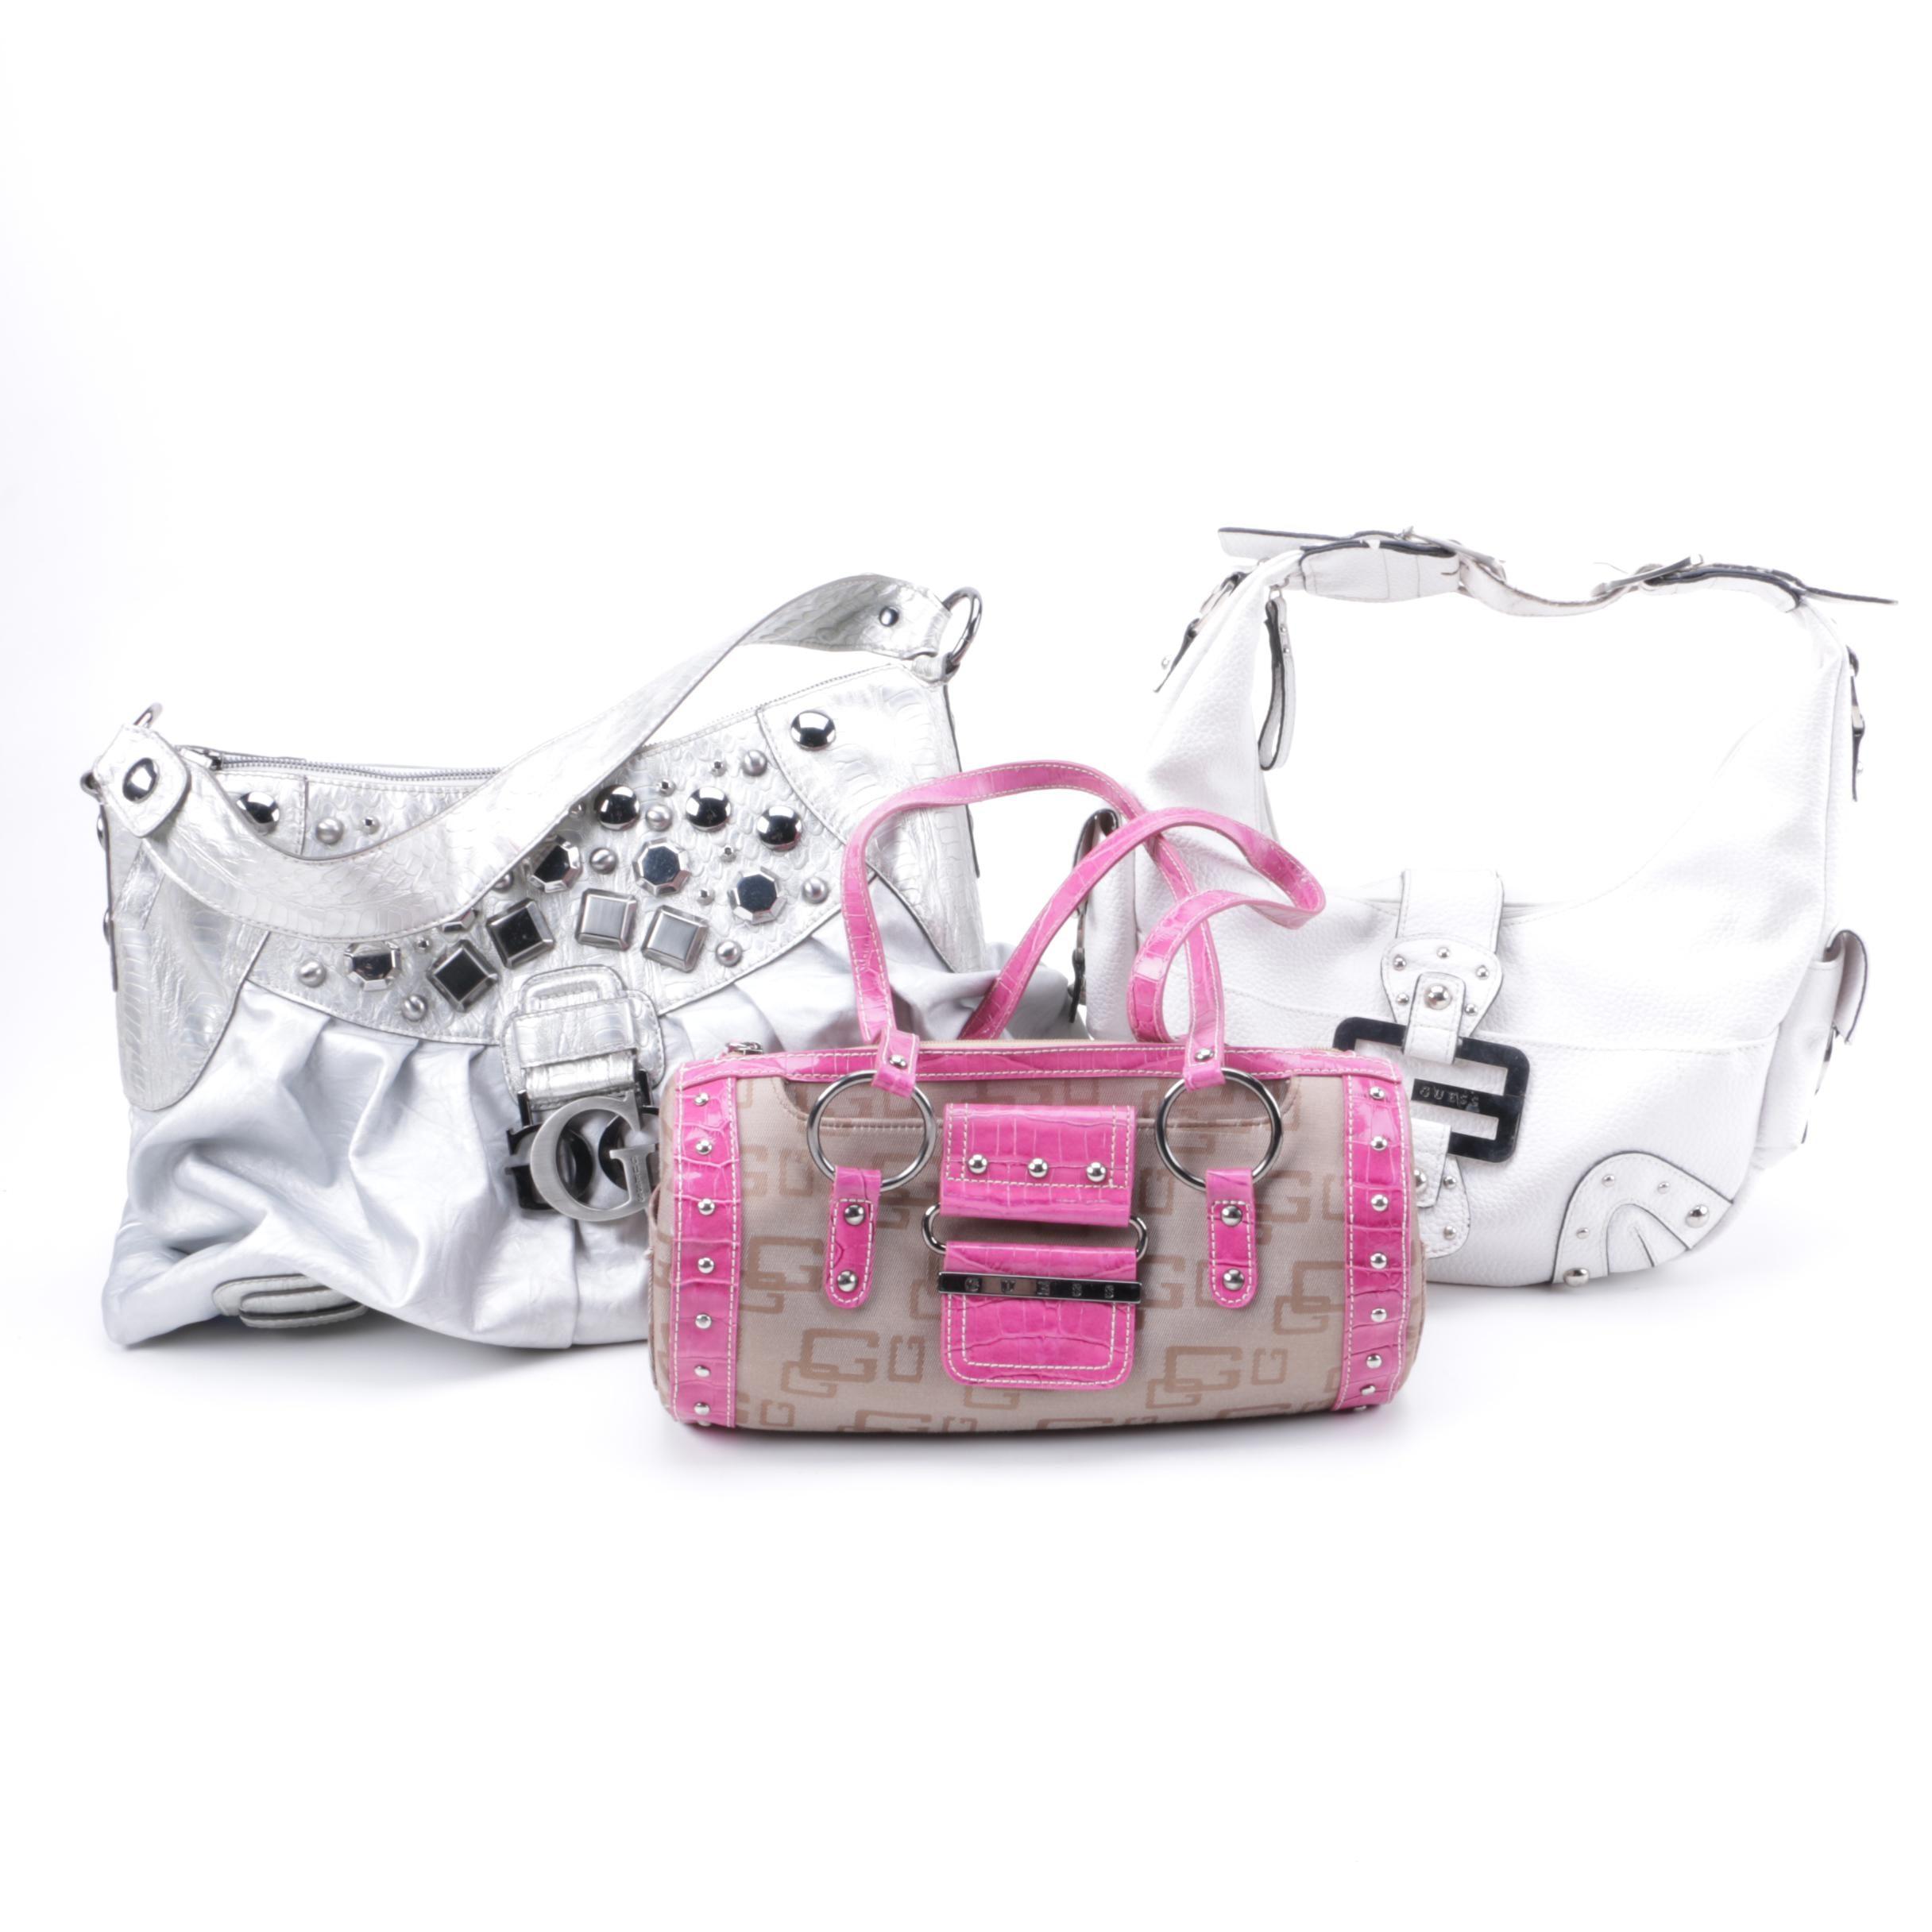 Women's Guess Handbag Collection